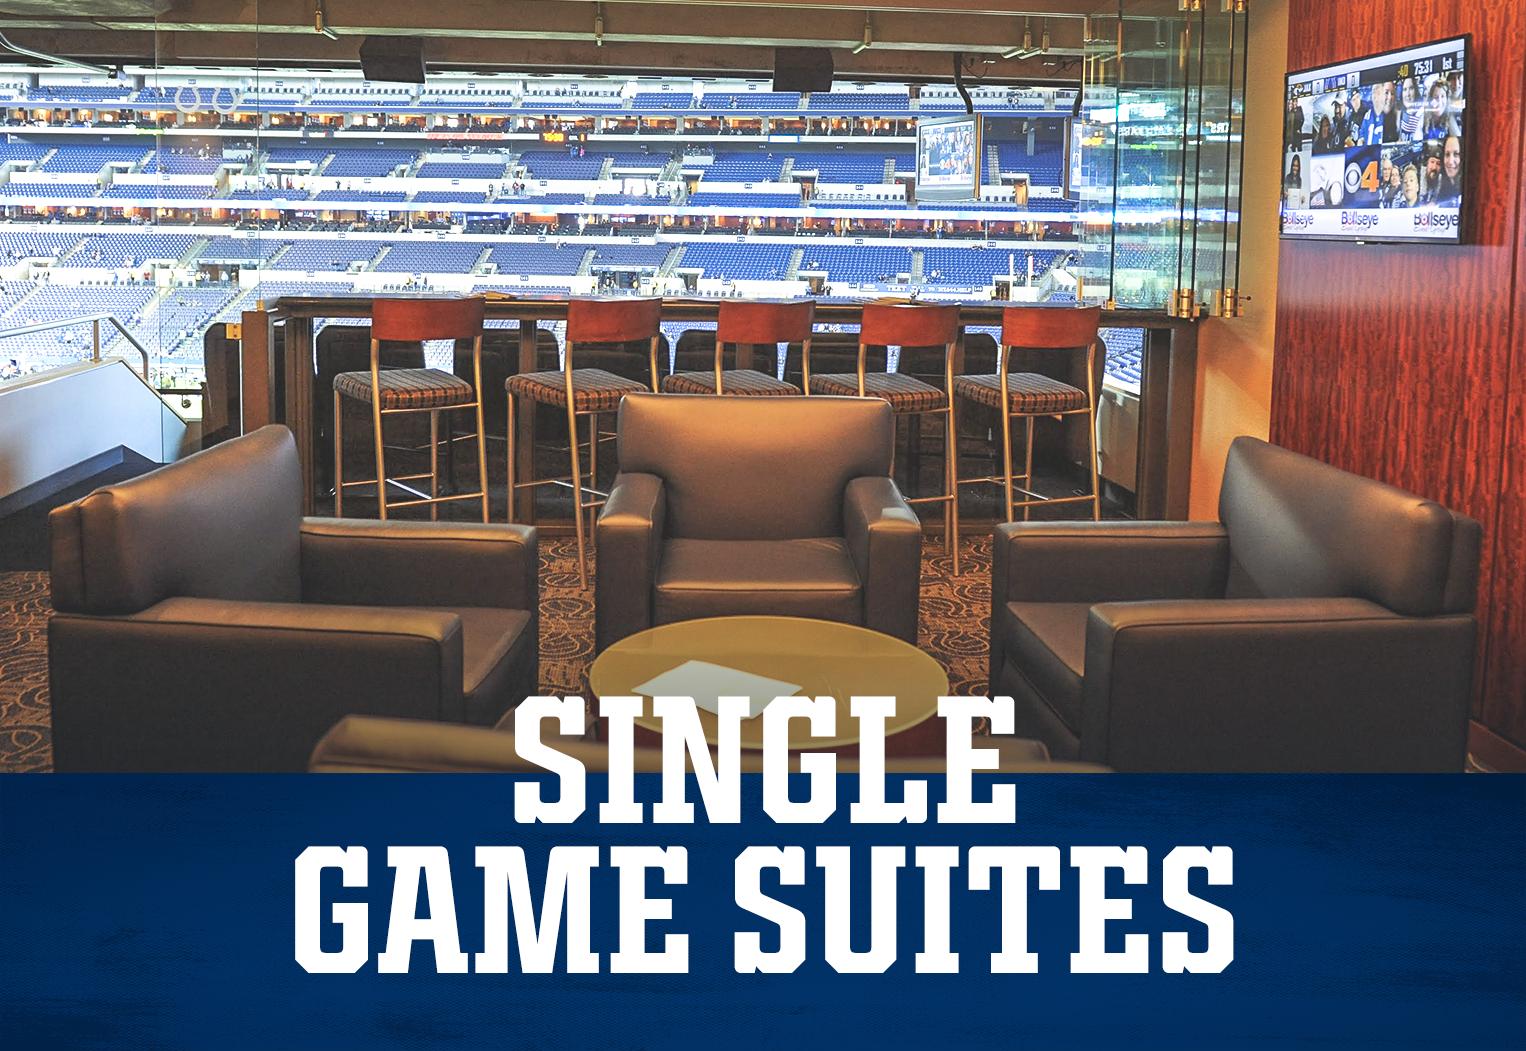 Indianapolis Colts Premium Seating Single Game Suites